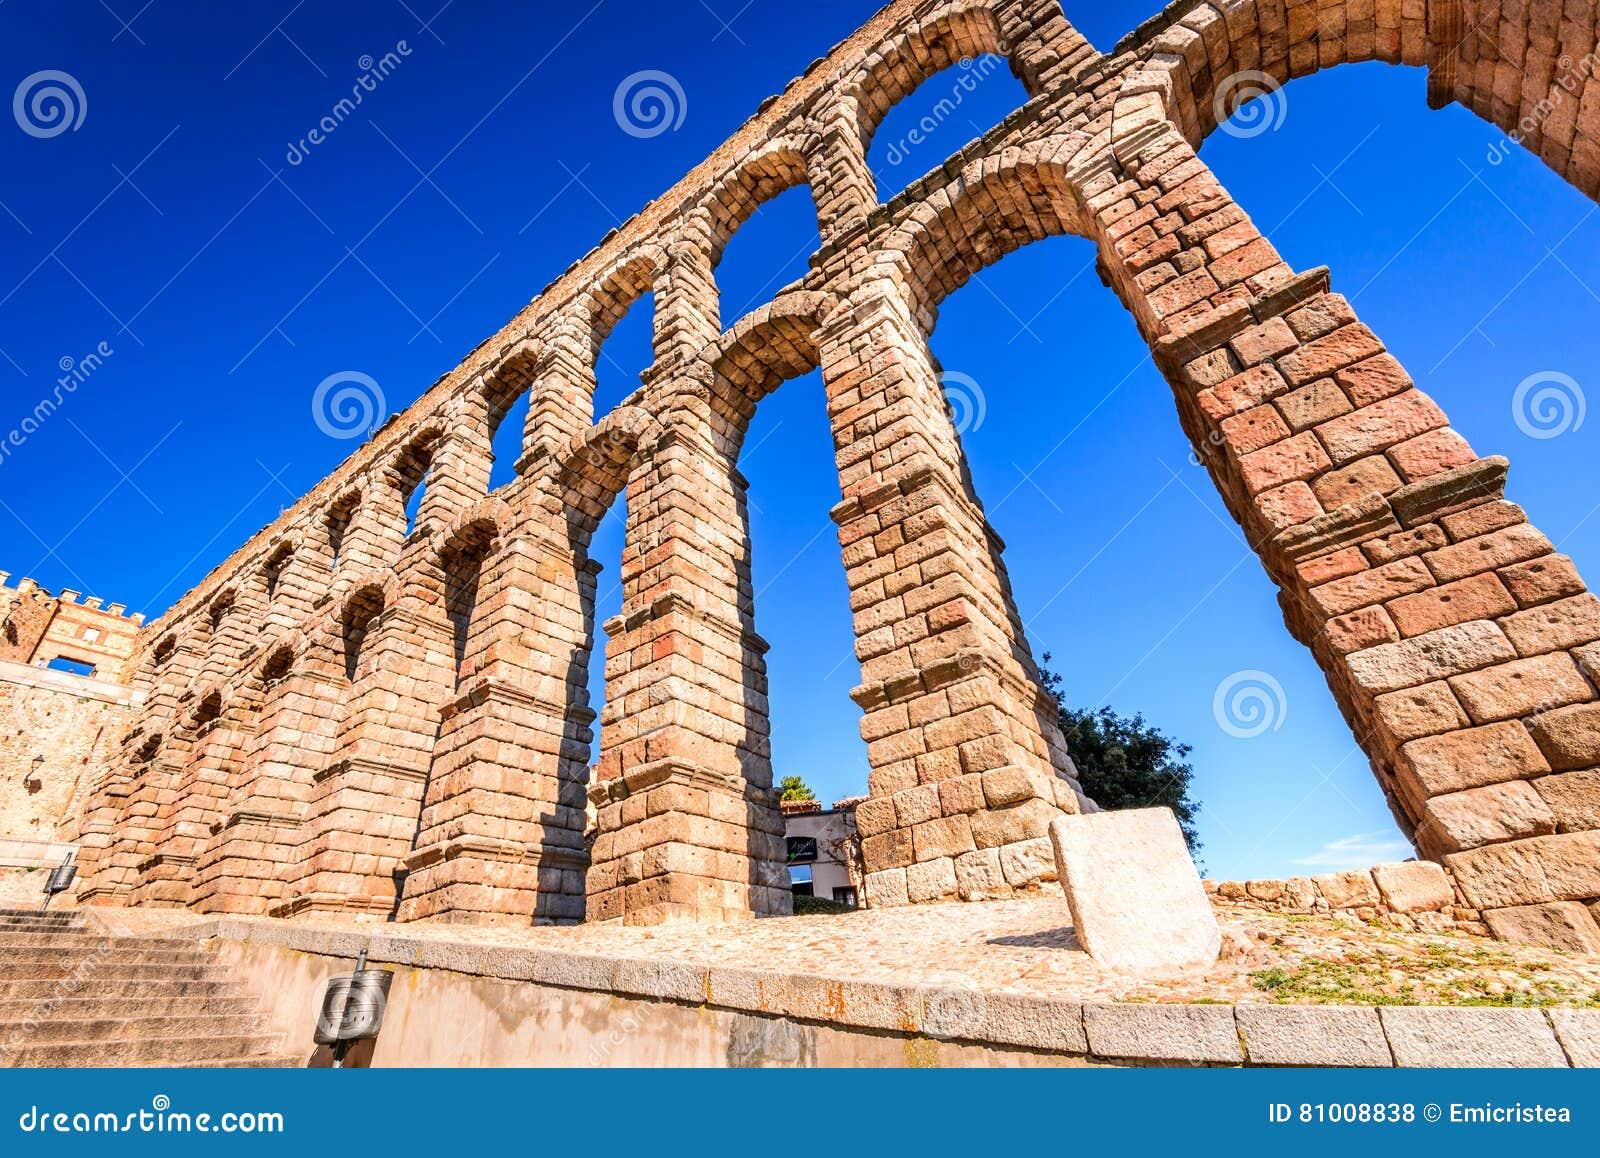 Aquedotto romano, Segovia, Spagna